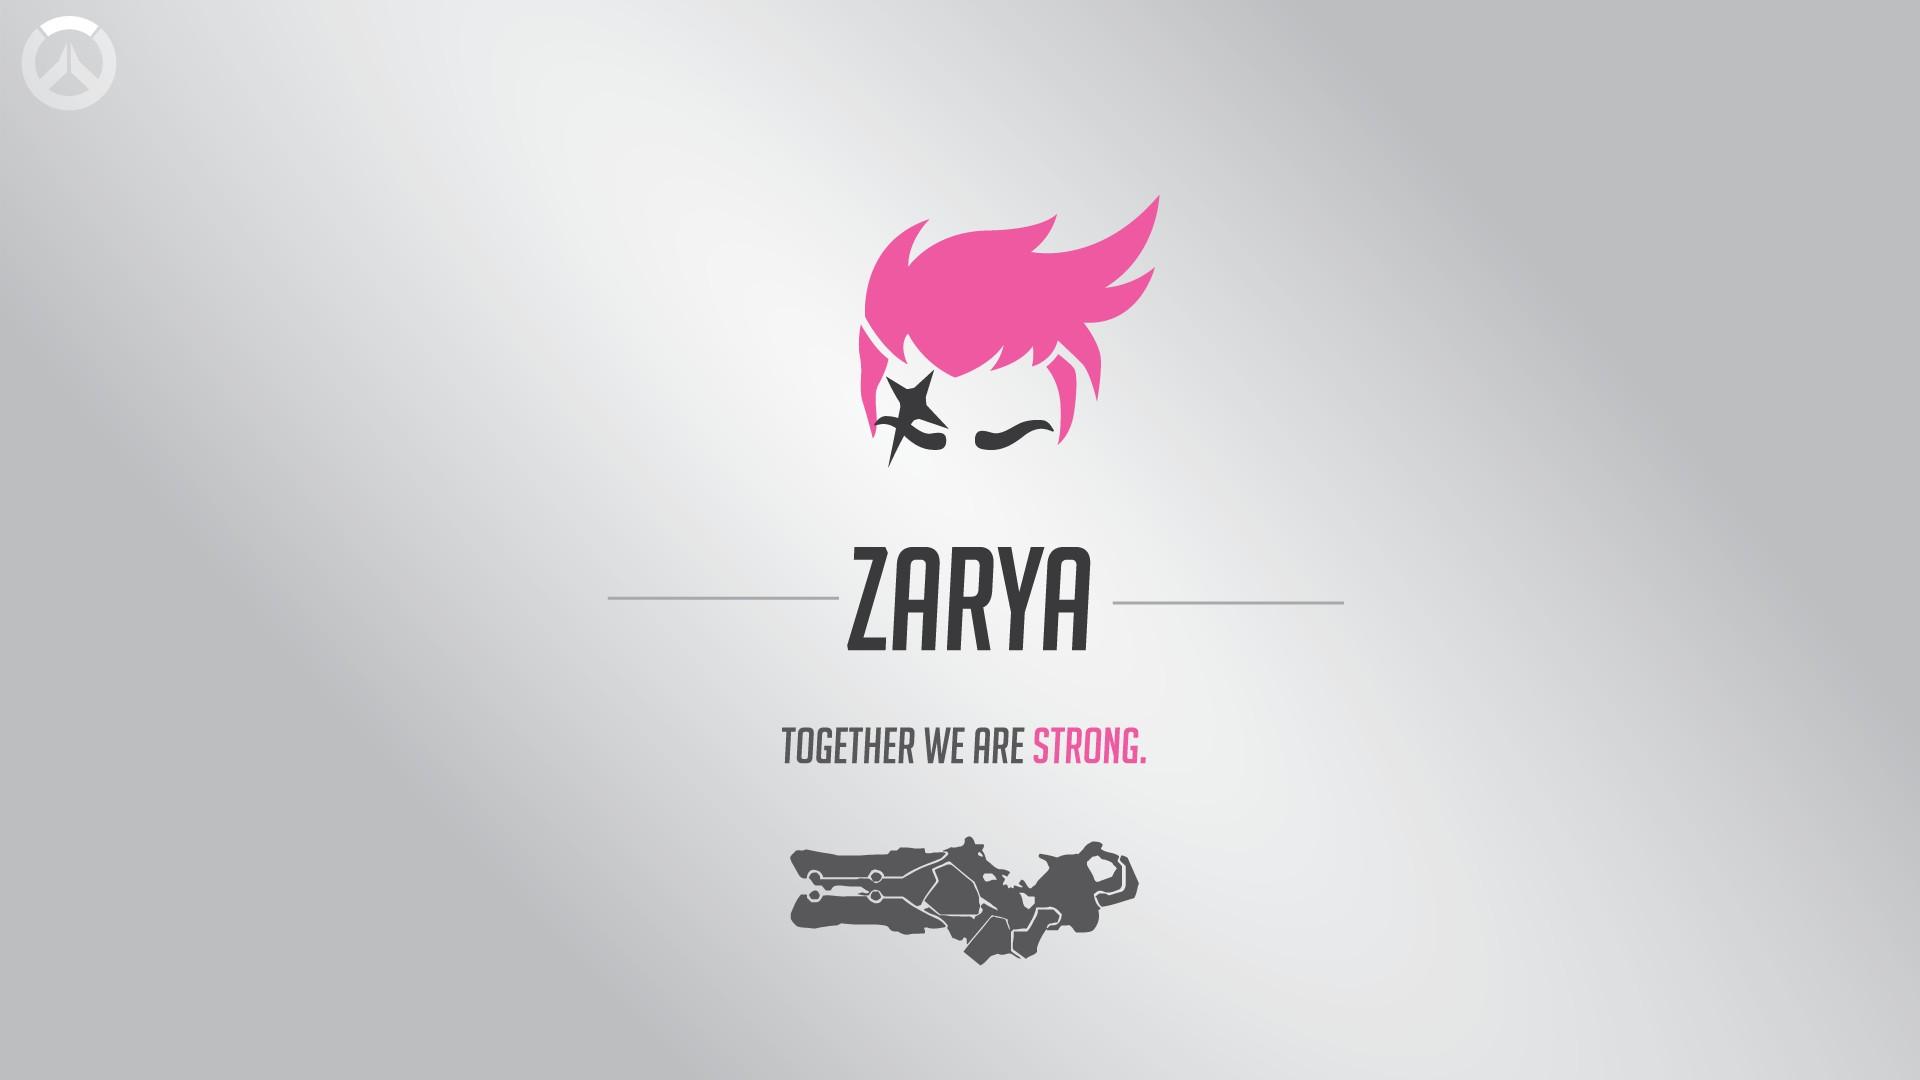 2048x2048 Sombra Overwatch Hd Ipad Air Hd 4k Wallpapers: Zarya Wallpaper ·① Download Free High Resolution